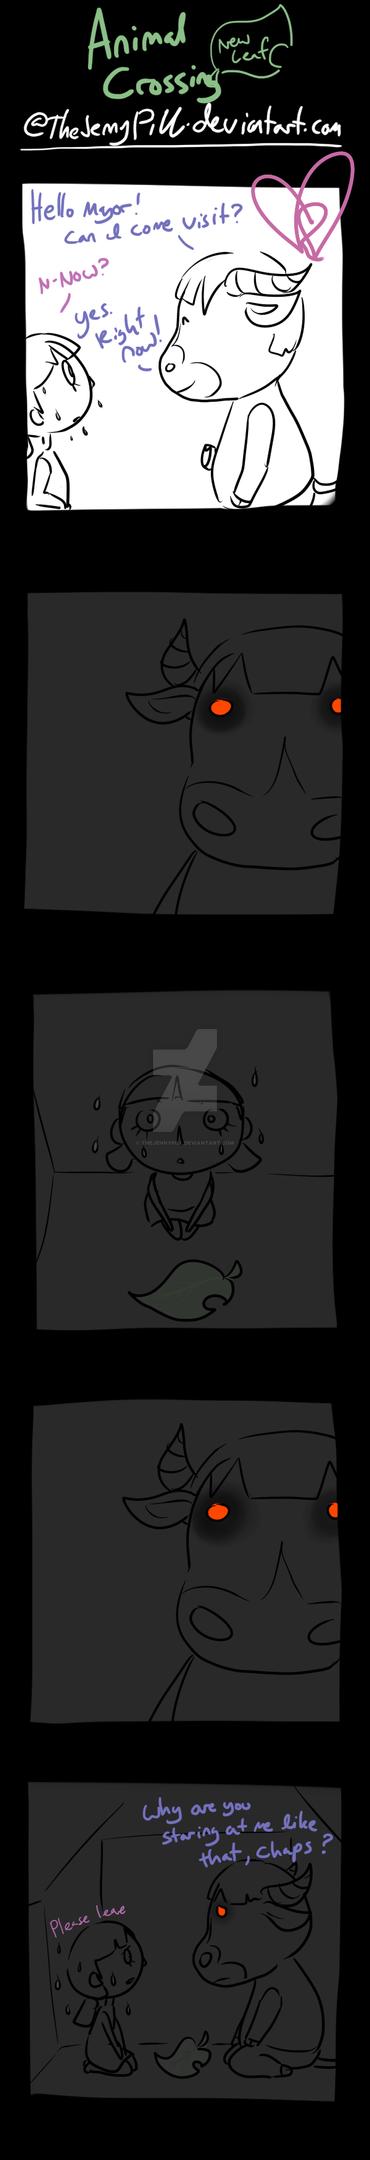 Animal Crossing New Leaf - comic 9